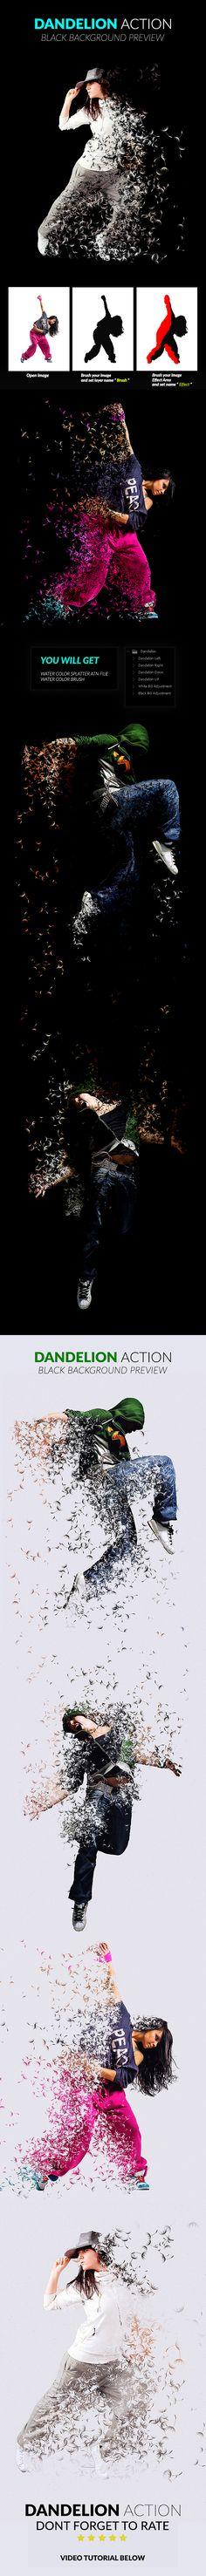 #Dandelion Action - Photo Effects Actions #PSAction #Photoshop #PS #Graphicriver #PhotoEffects #Design #Art #Digitalart